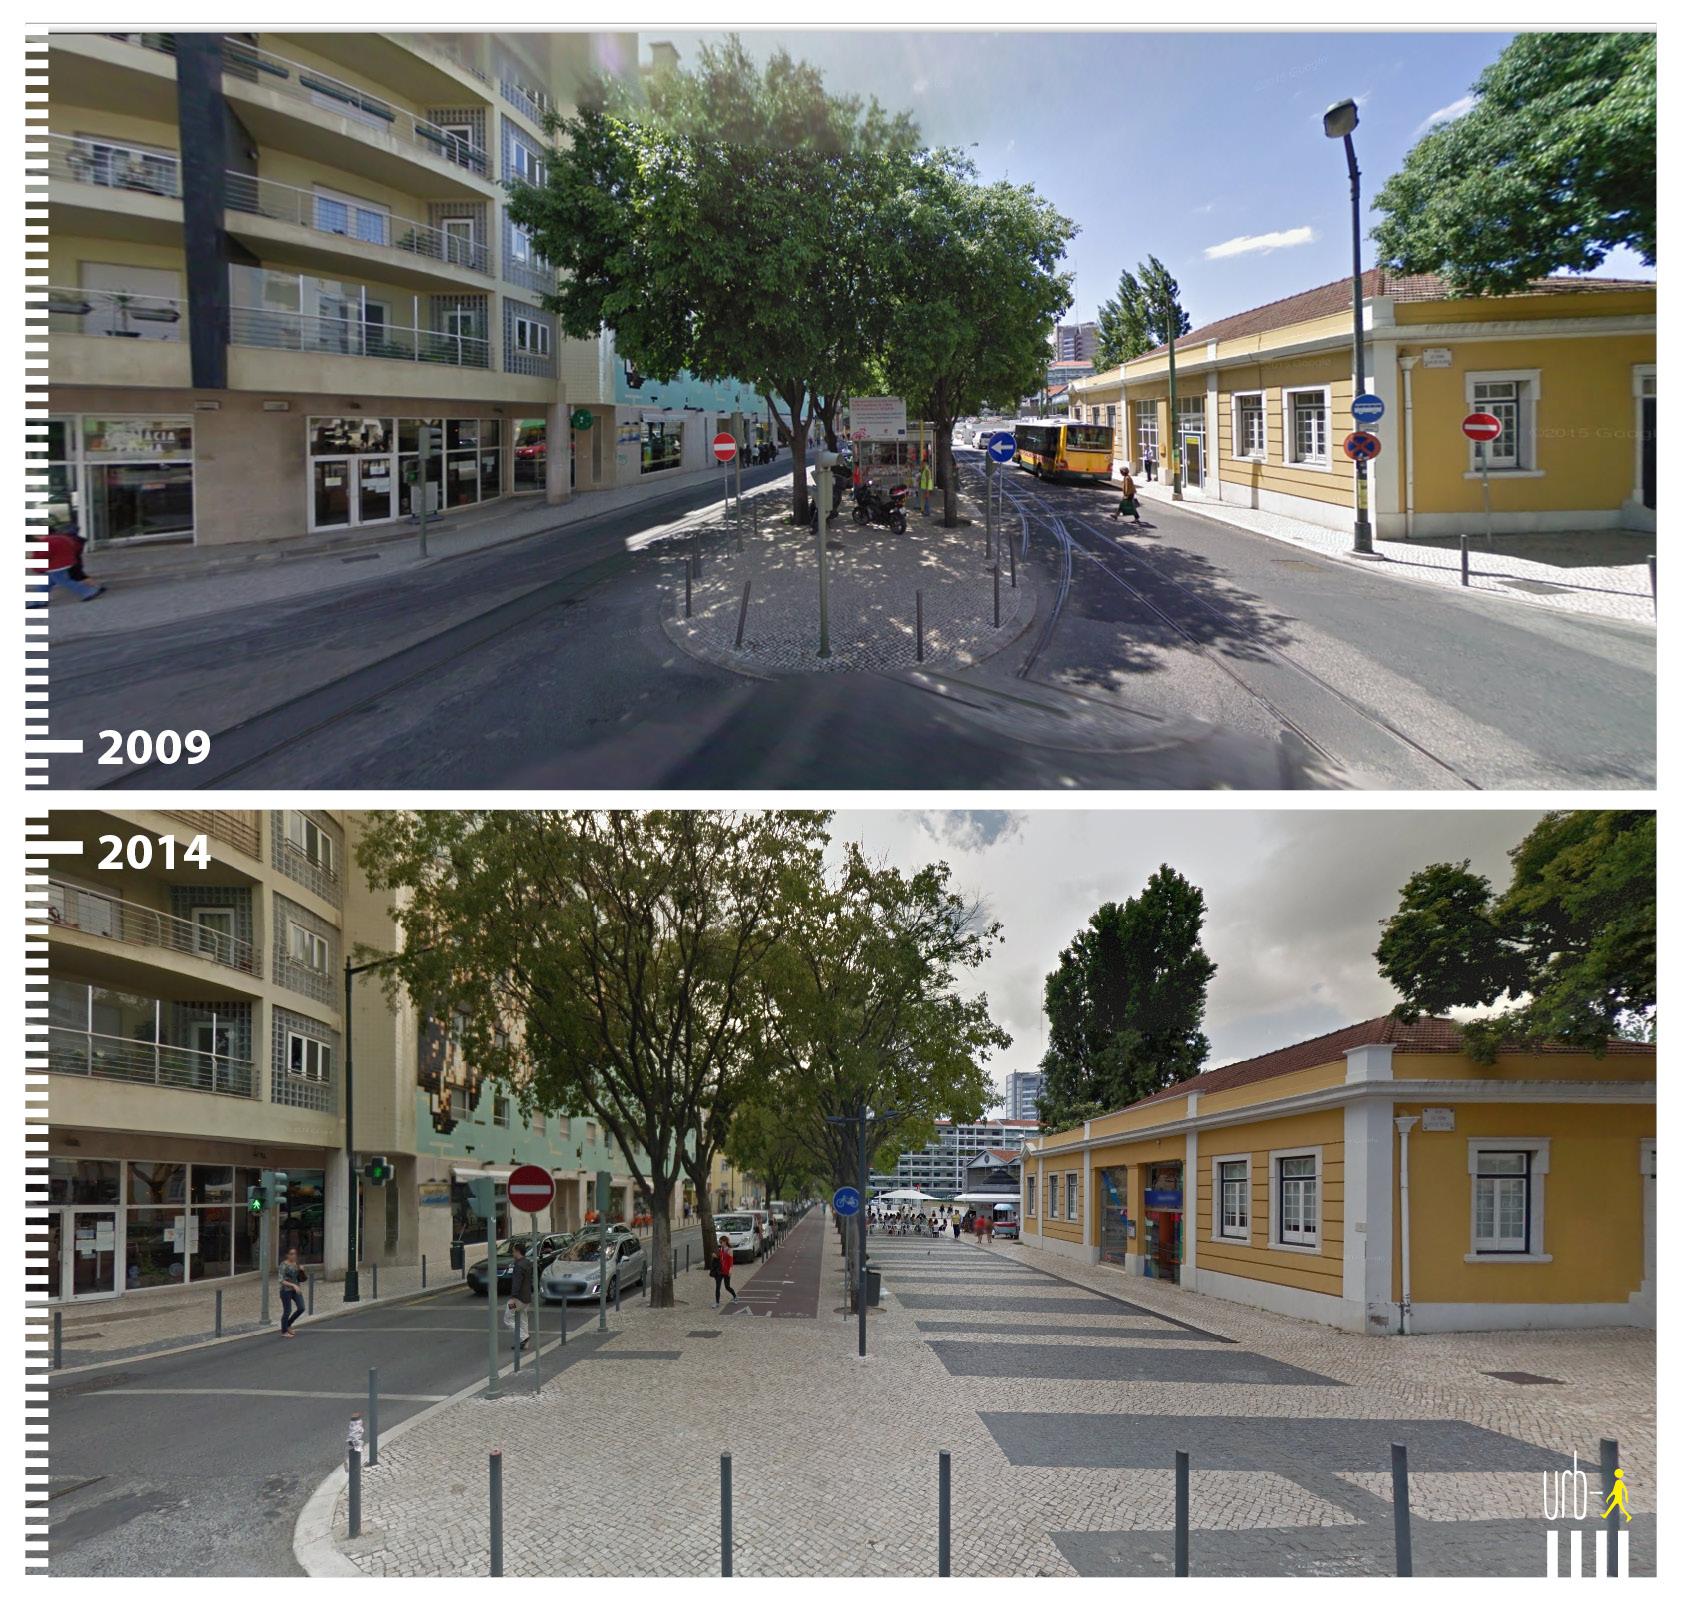 0698 PT Lisbon, Av Duque de Avila